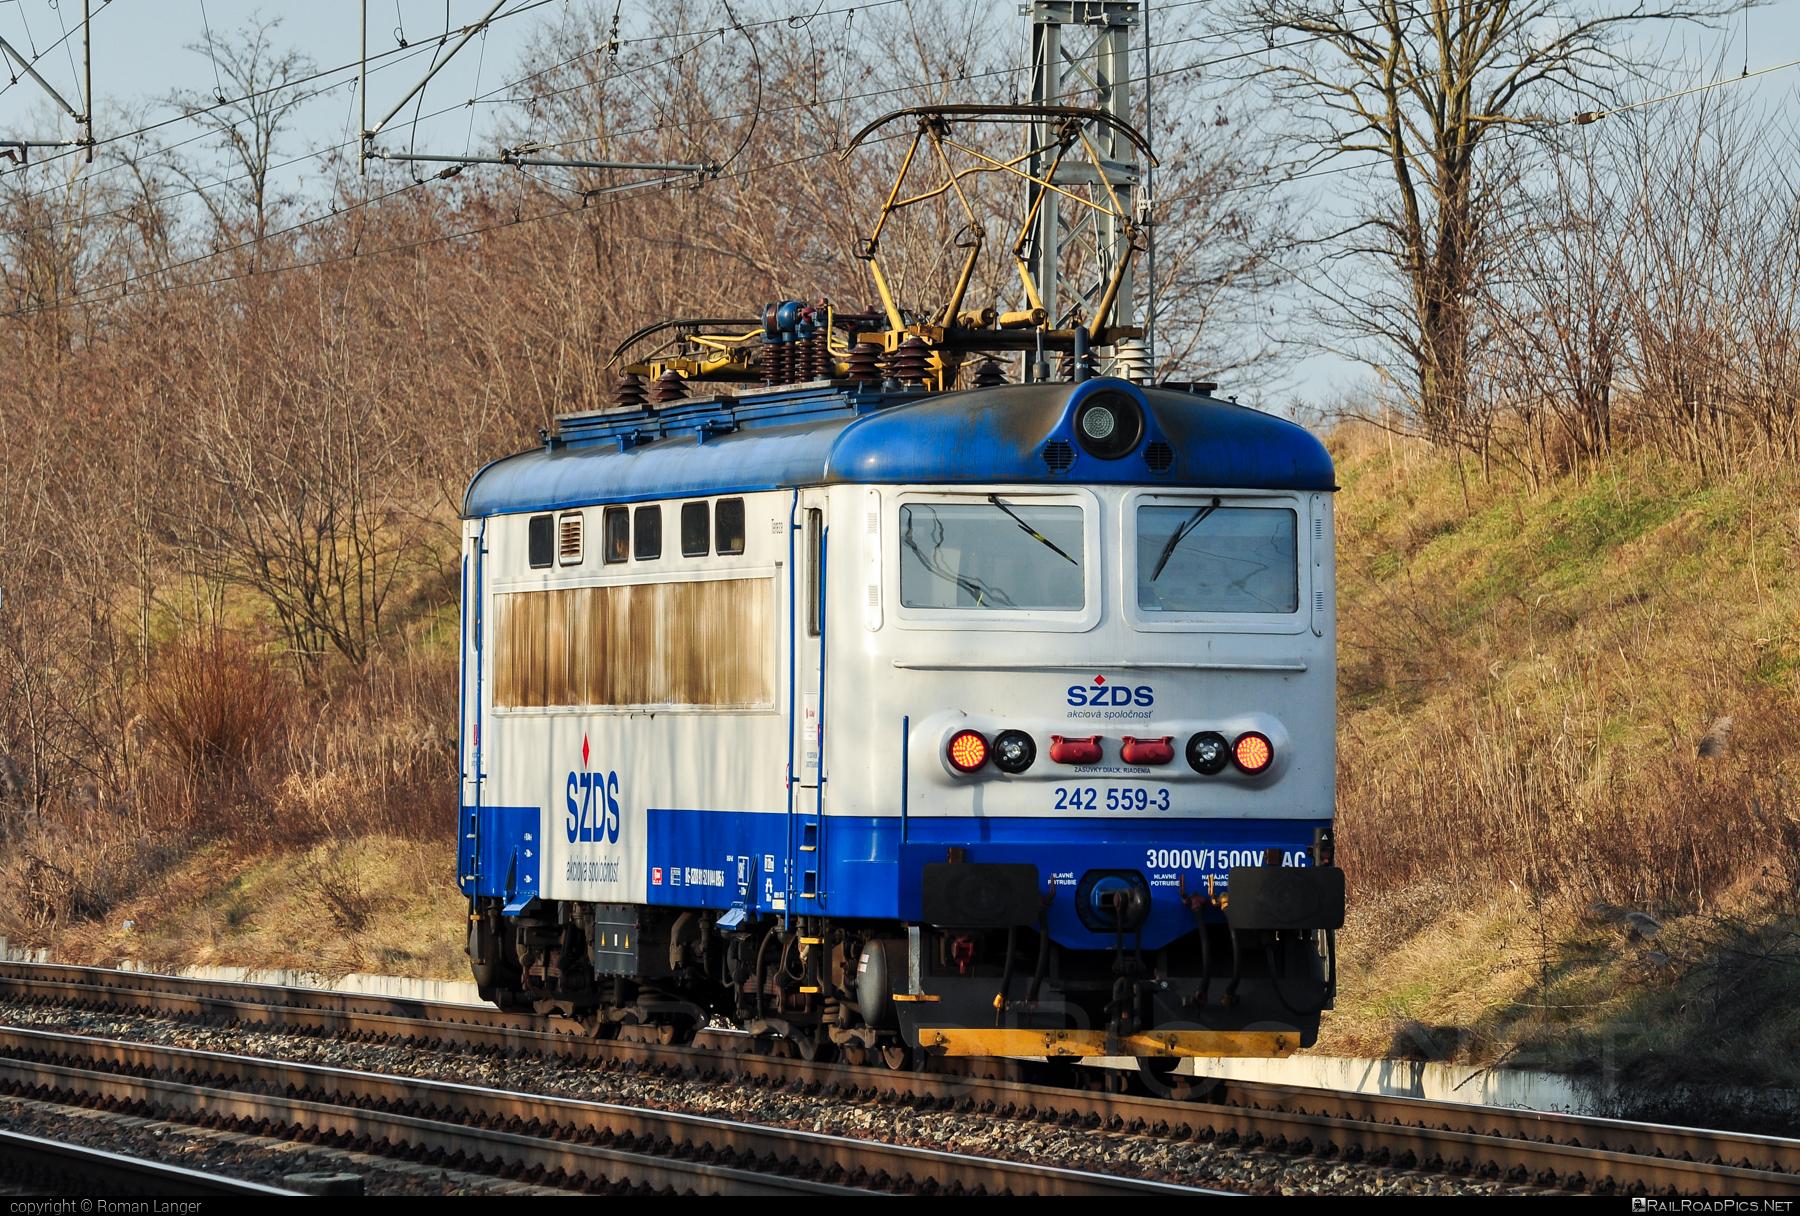 Škoda 73E - 242 559-3 operated by I. G. Rail, s. r. o. #igrail #locomotive242 #plechac #skoda #skoda73e #szds